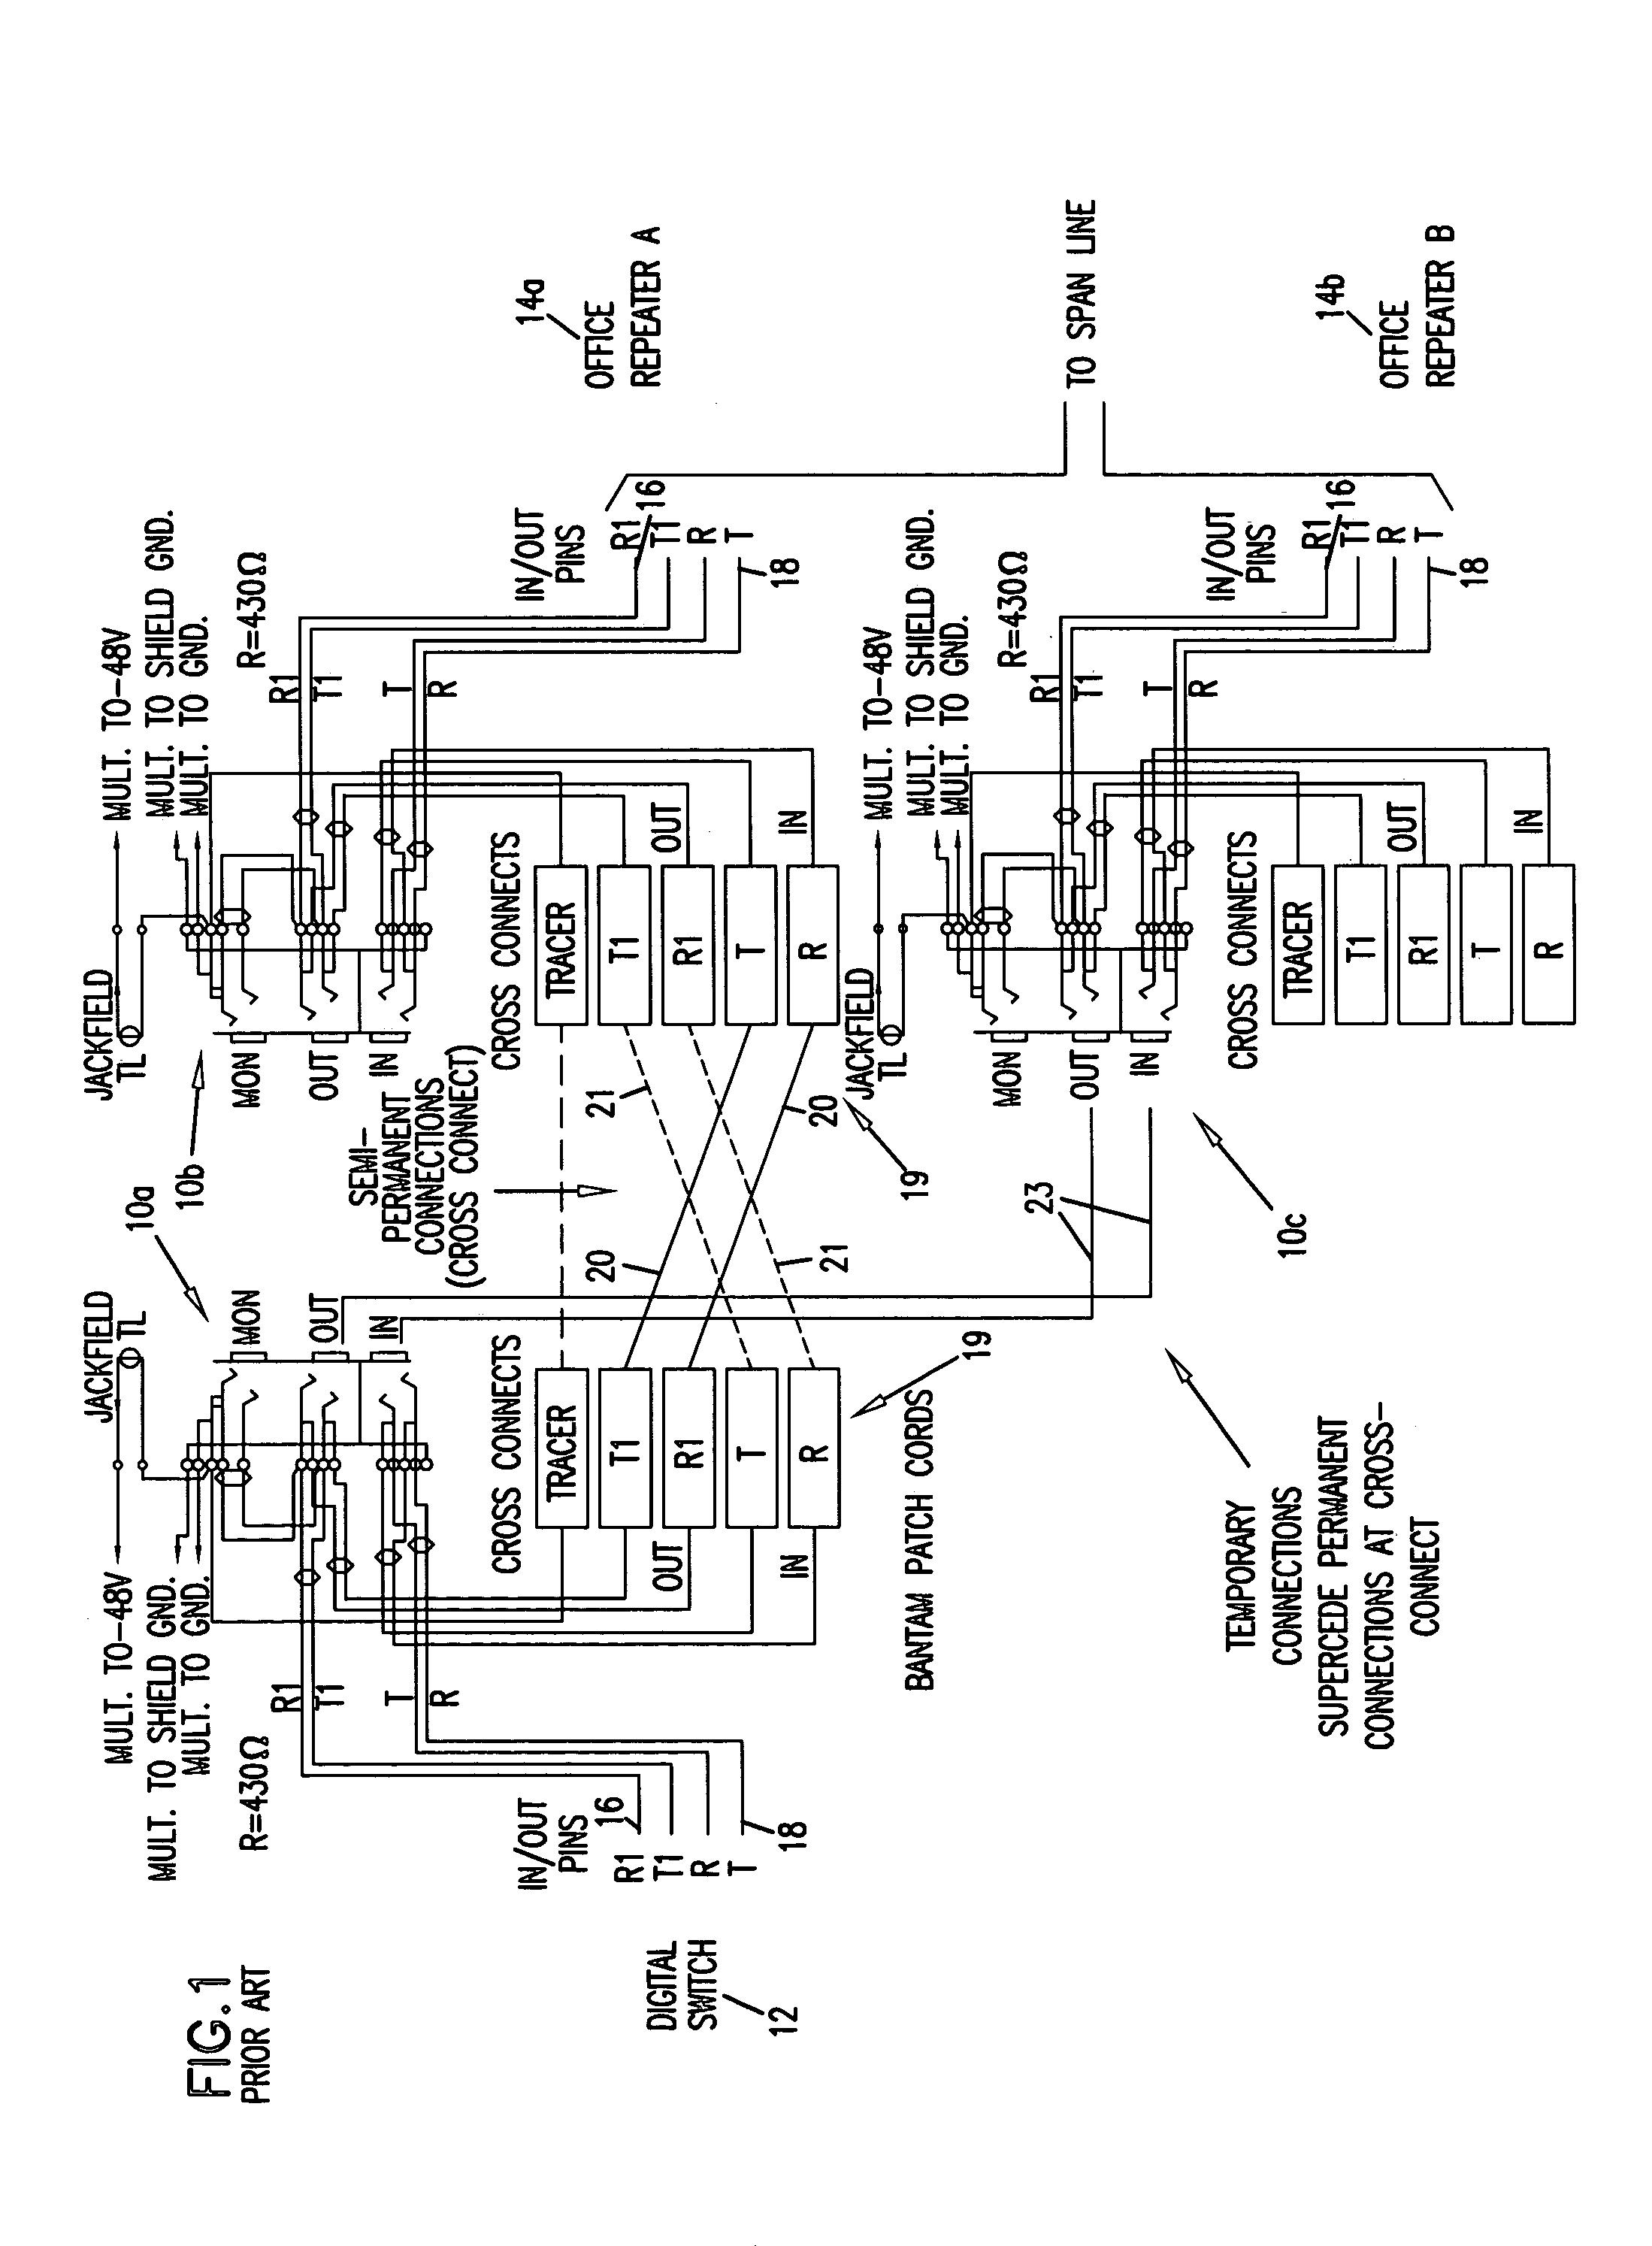 dsx panel wiring lenel panel wiring